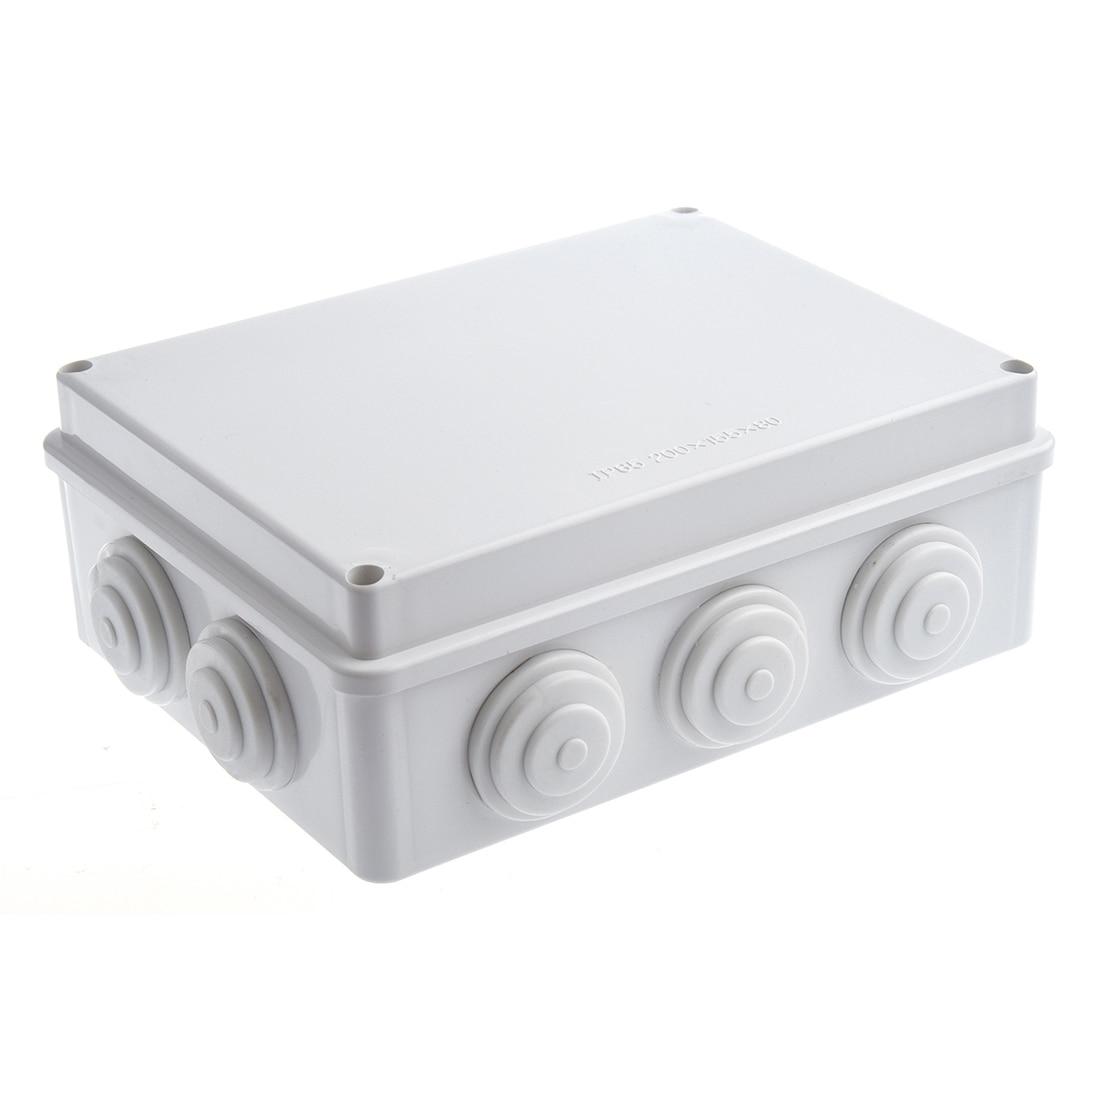 все цены на High Quality White ABS IP65 Waterproof Enclosure Junction Box 200mmx155mmx80mm онлайн